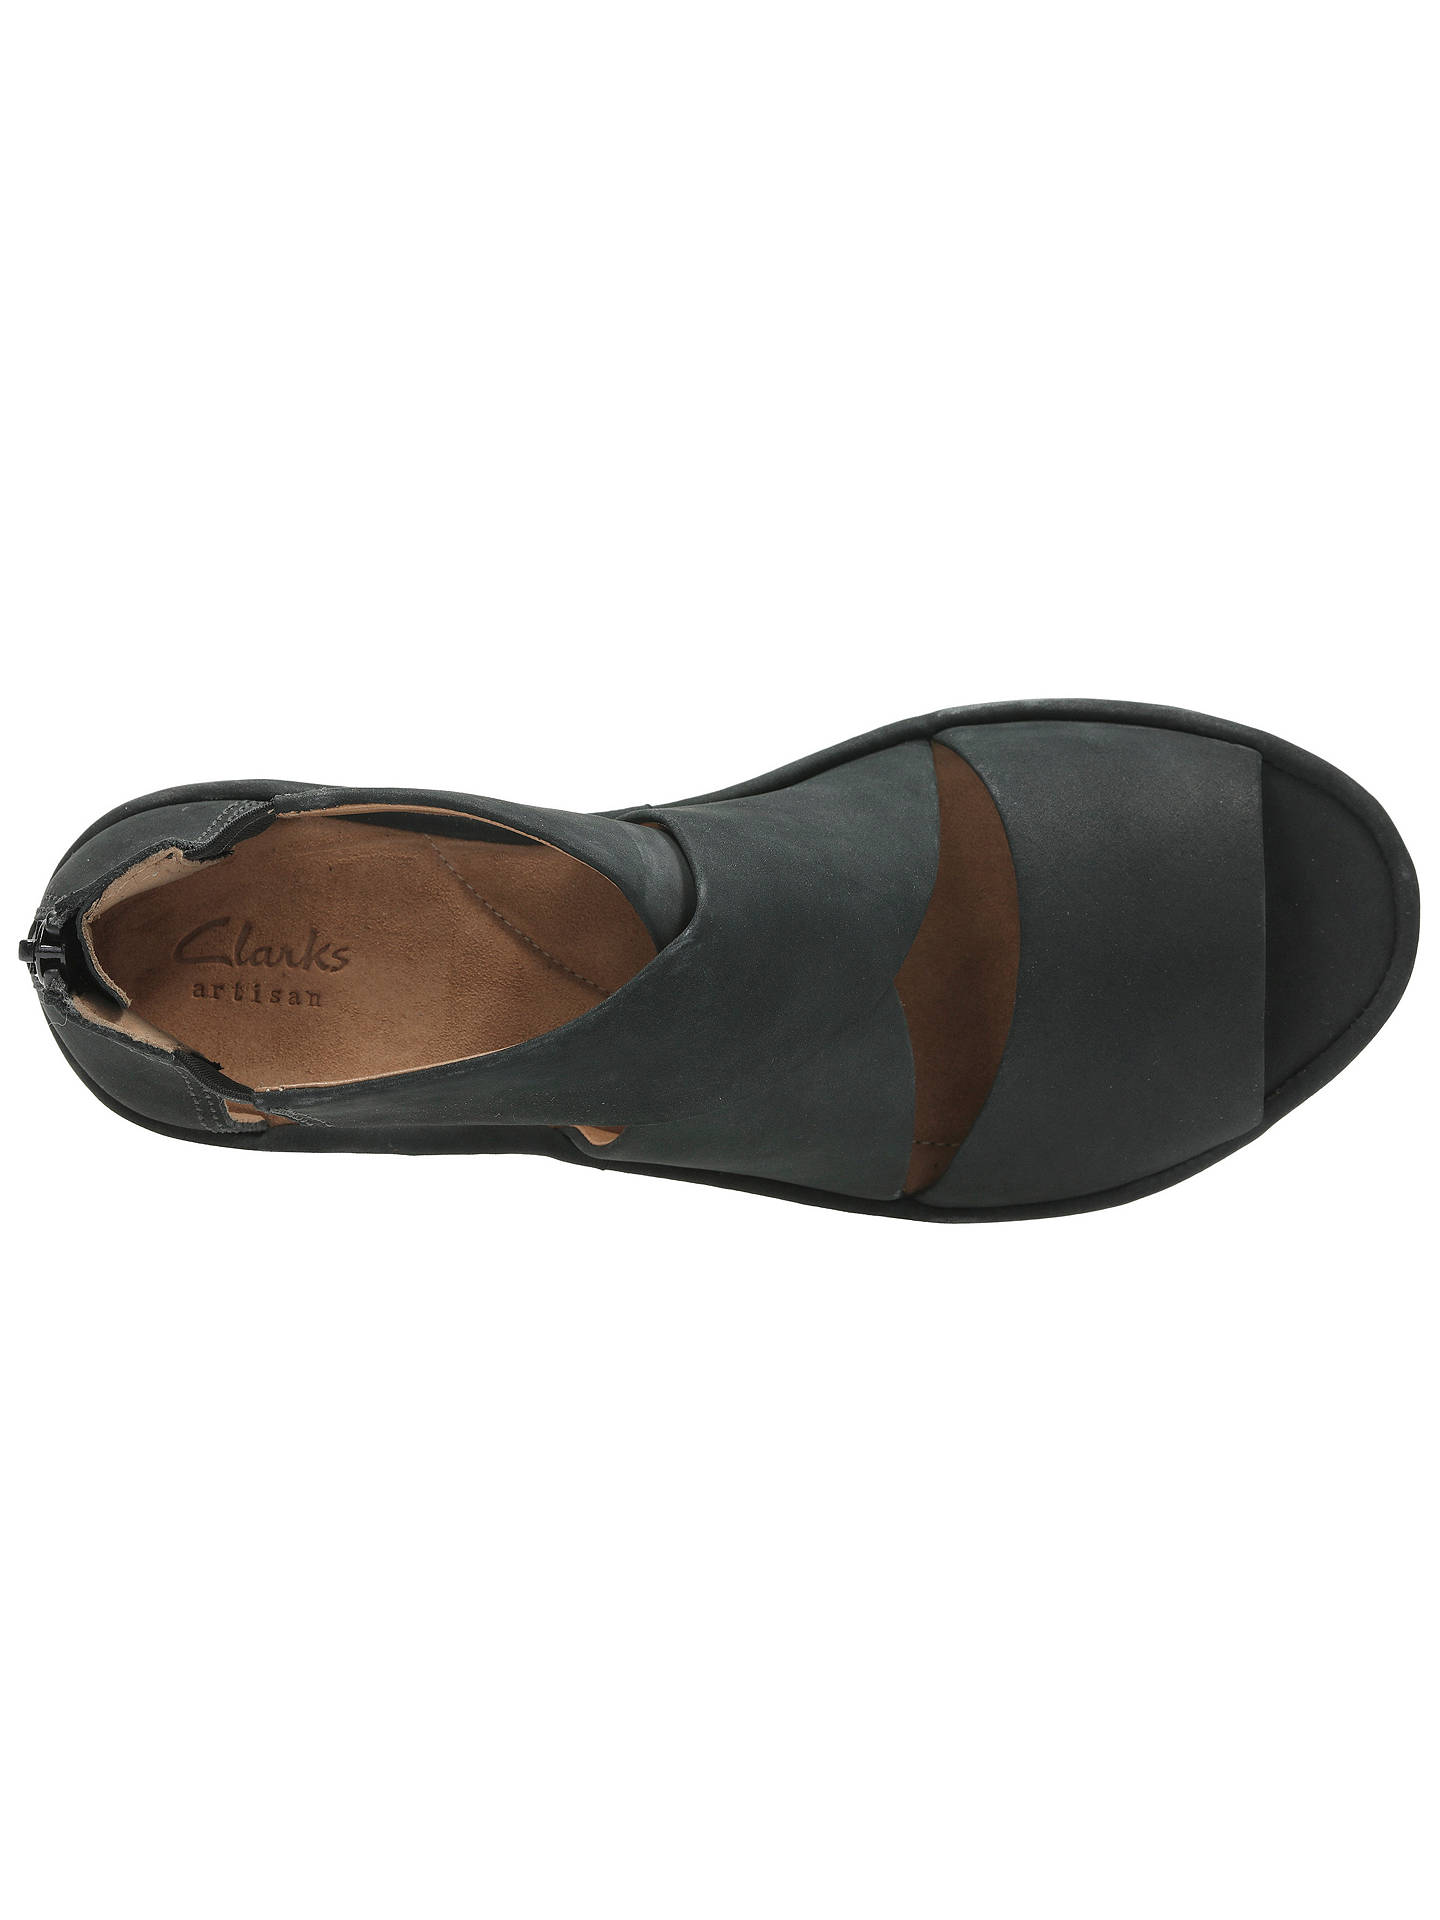 99ada1db1a94 ... Buy Clarks Clarene Glamor Wedge Heeled Sandals